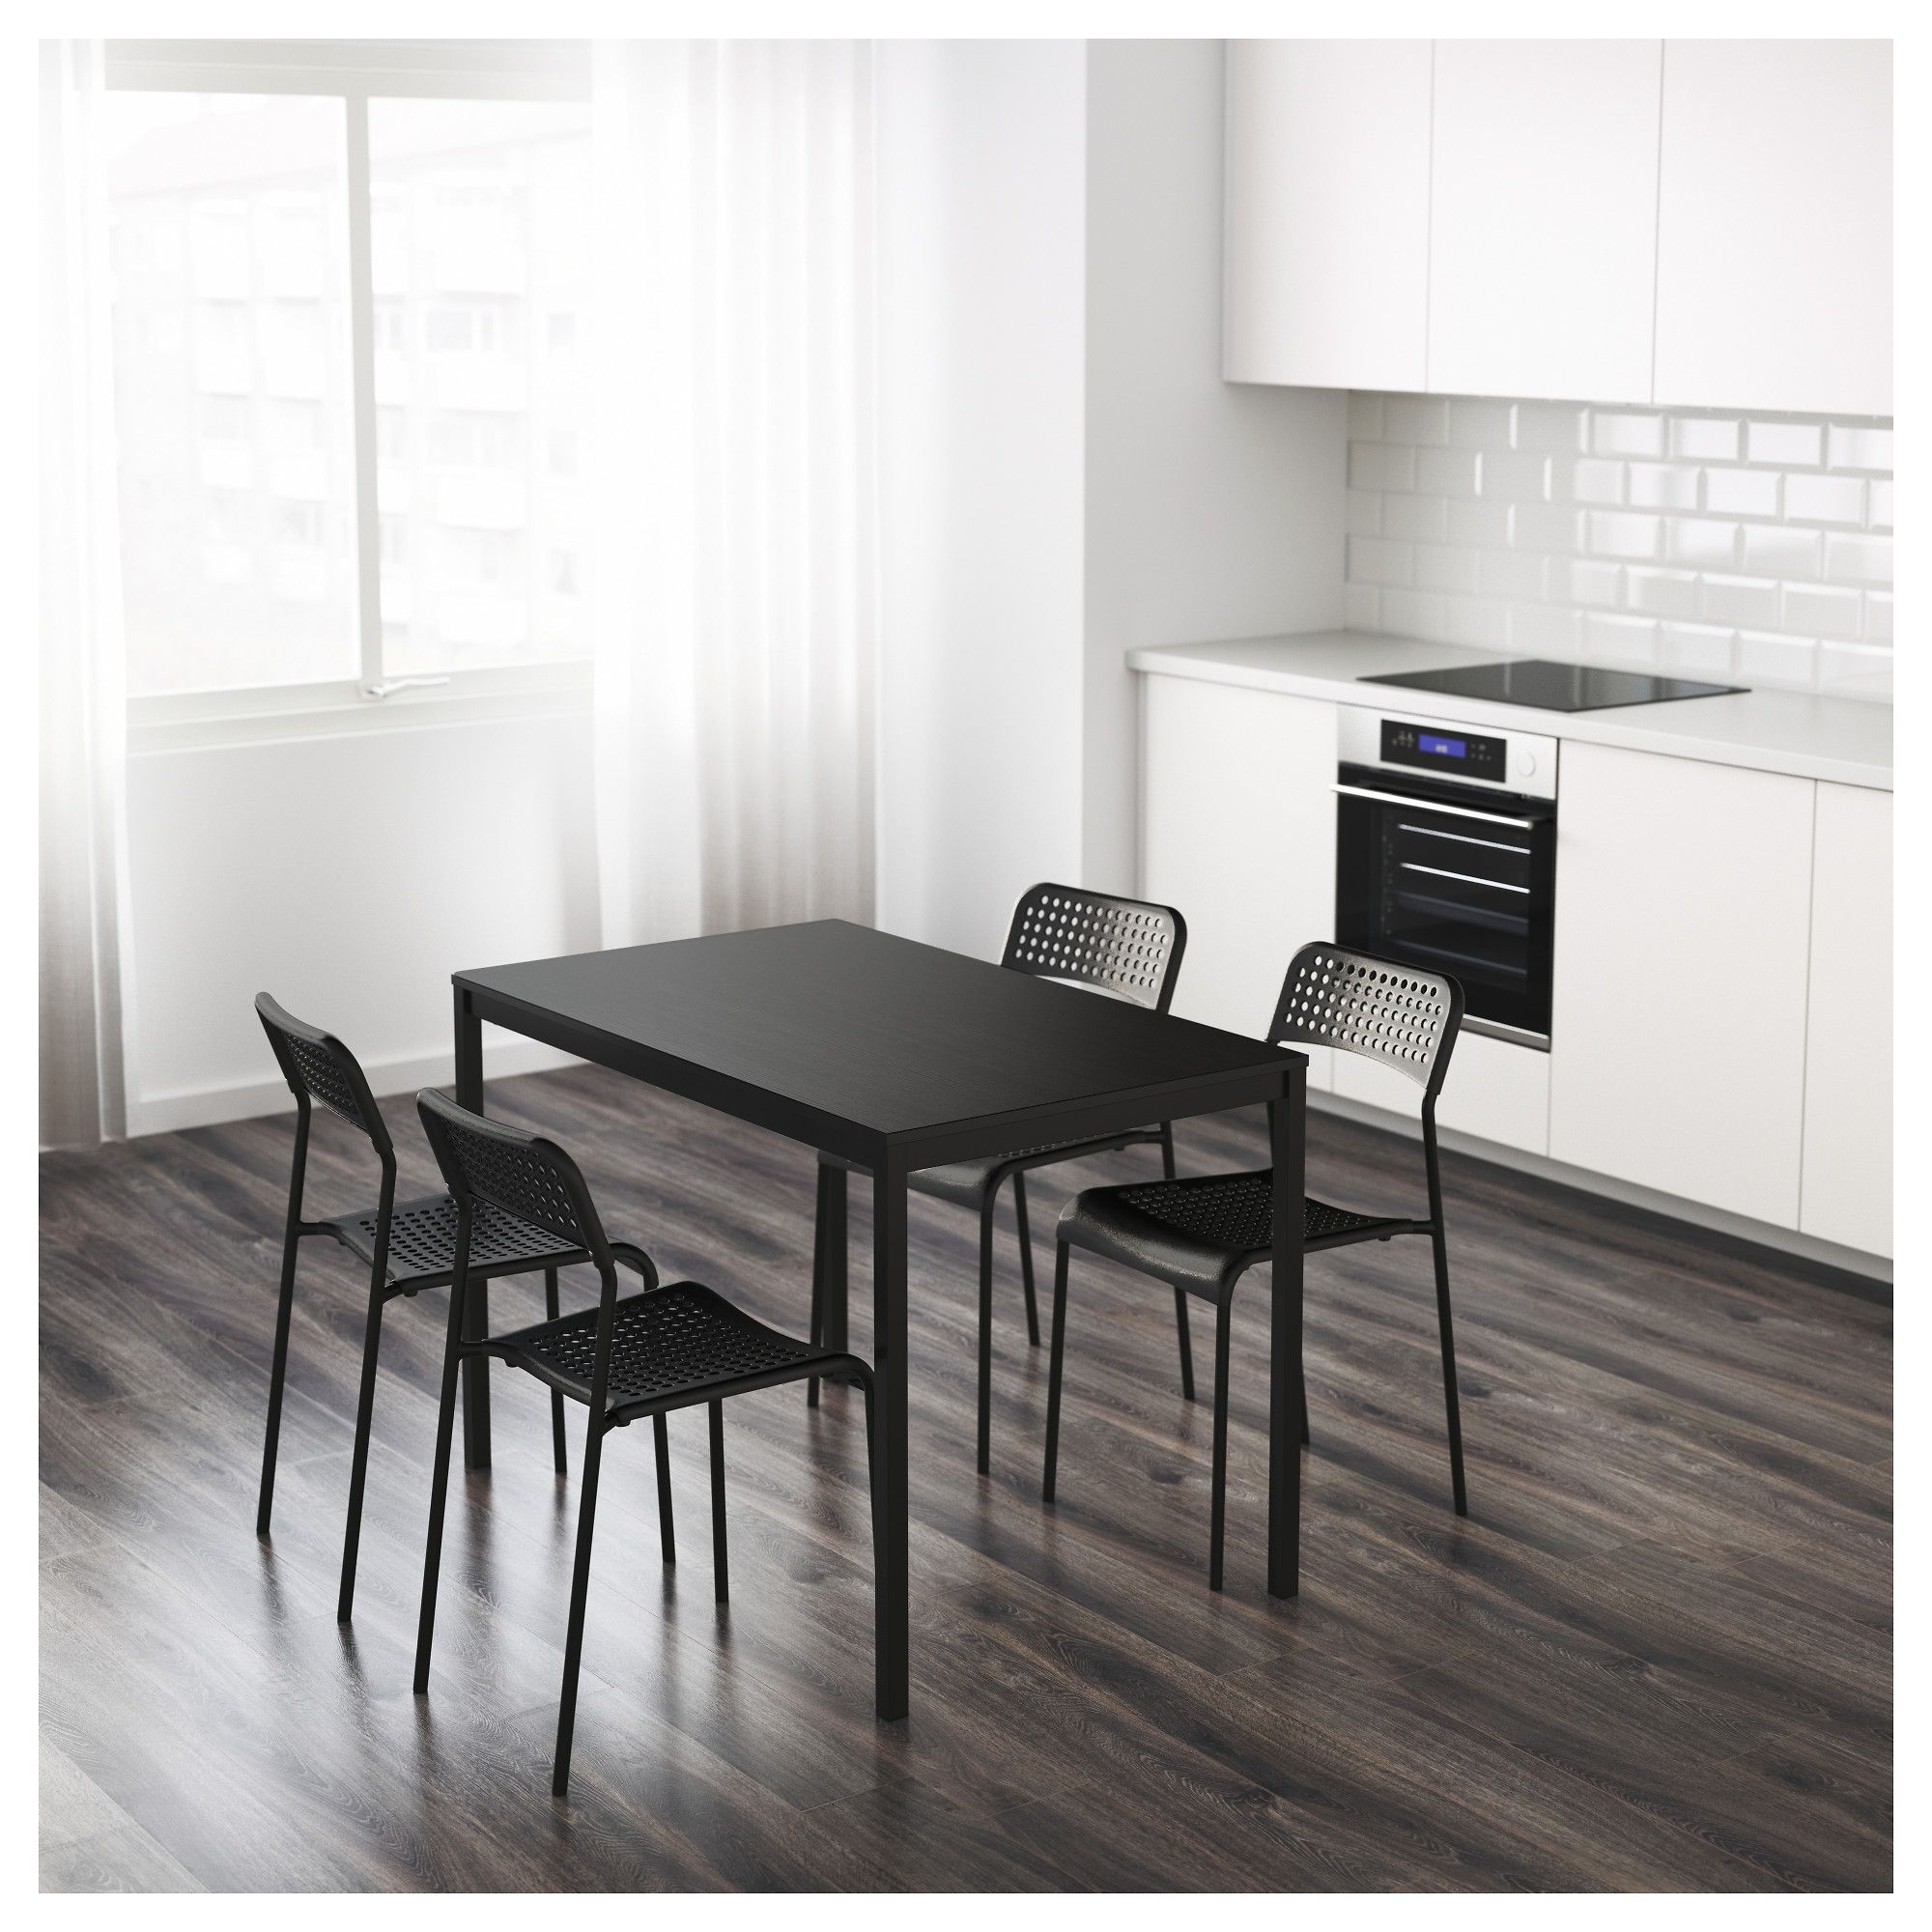 Tarendo Table Black 43 1 4x26 3 8 Ikea Table Ikea Dining